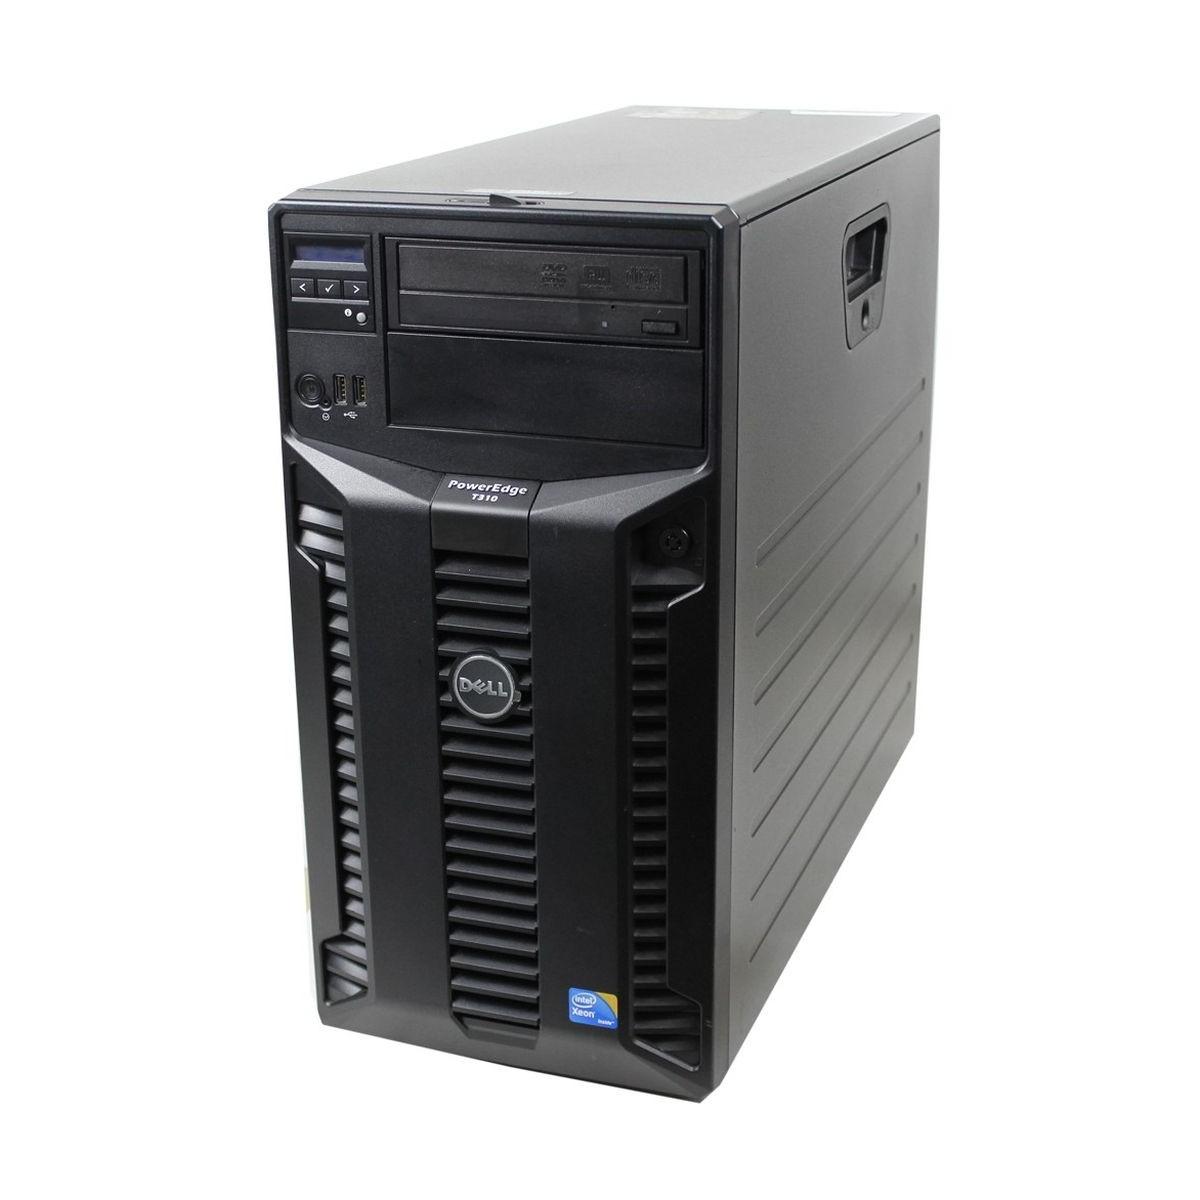 DELL T310 x3450 16GB 4xSAS RAID P6i 2xPSU W10 PRO